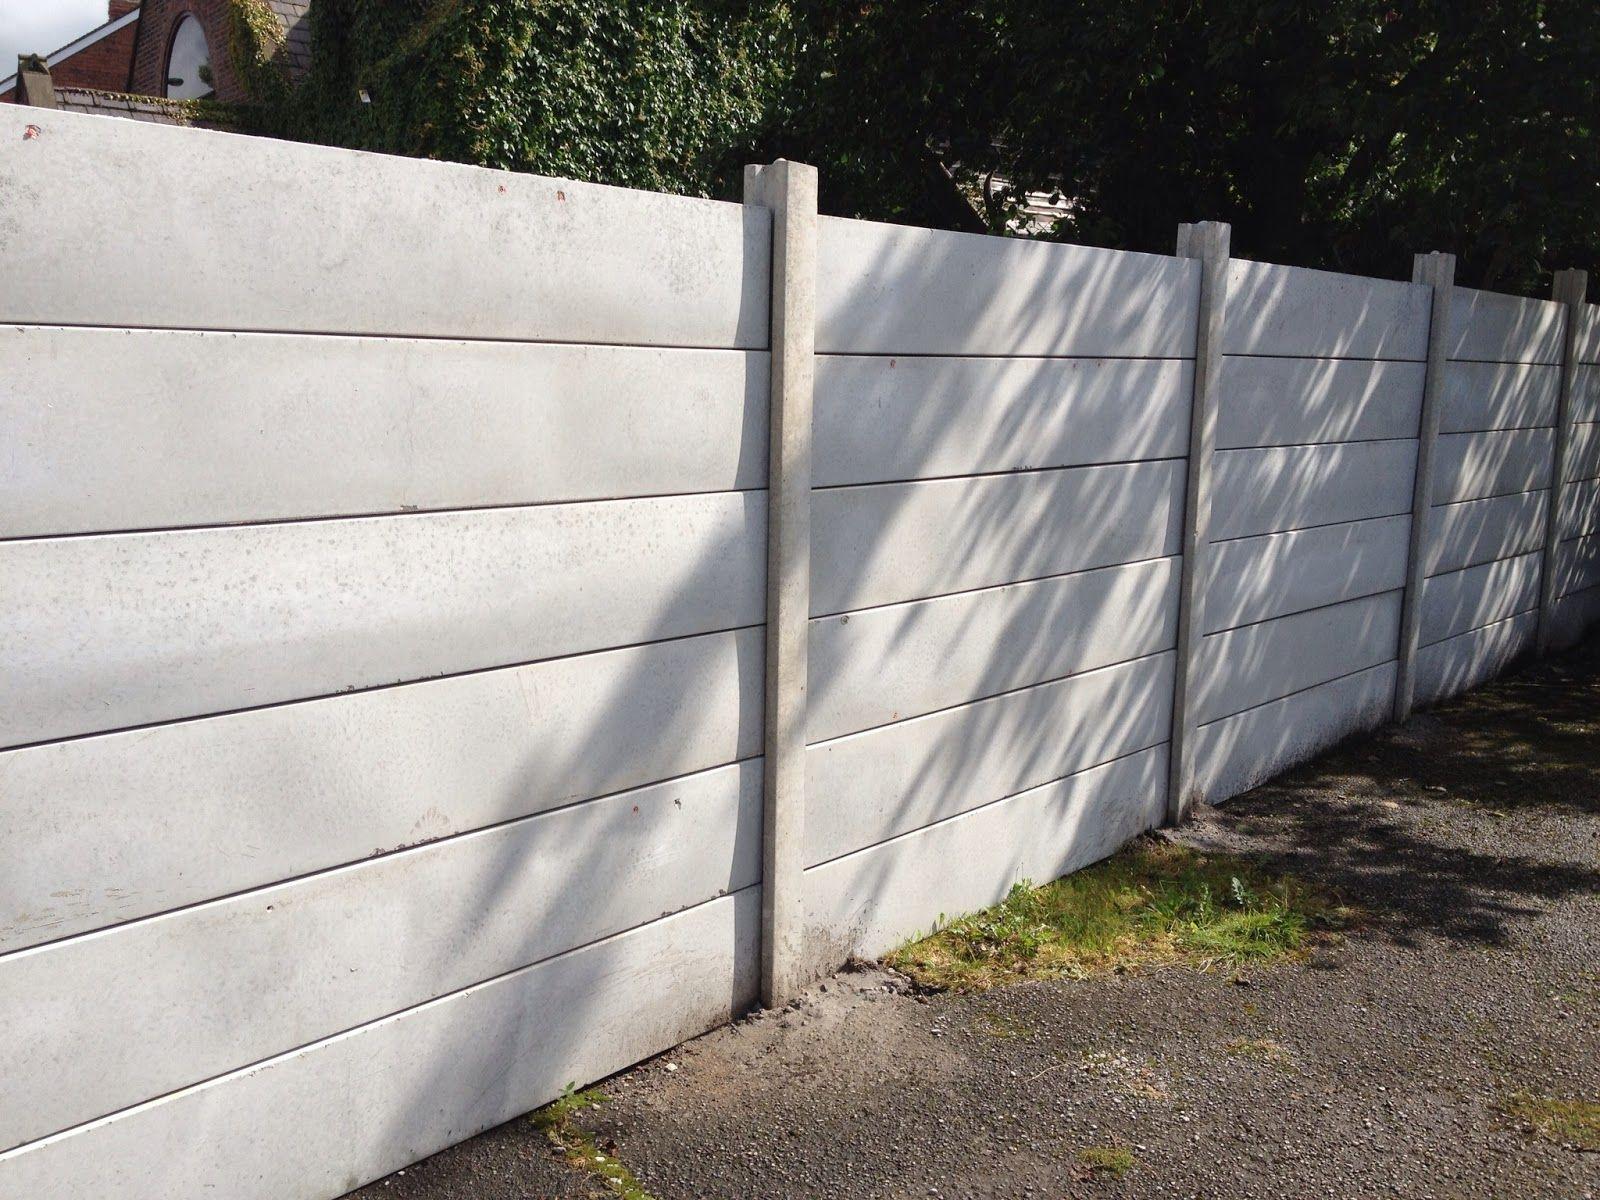 Gravelboard Fence By Armcon Precast Jpg 1600 1200 Concrete